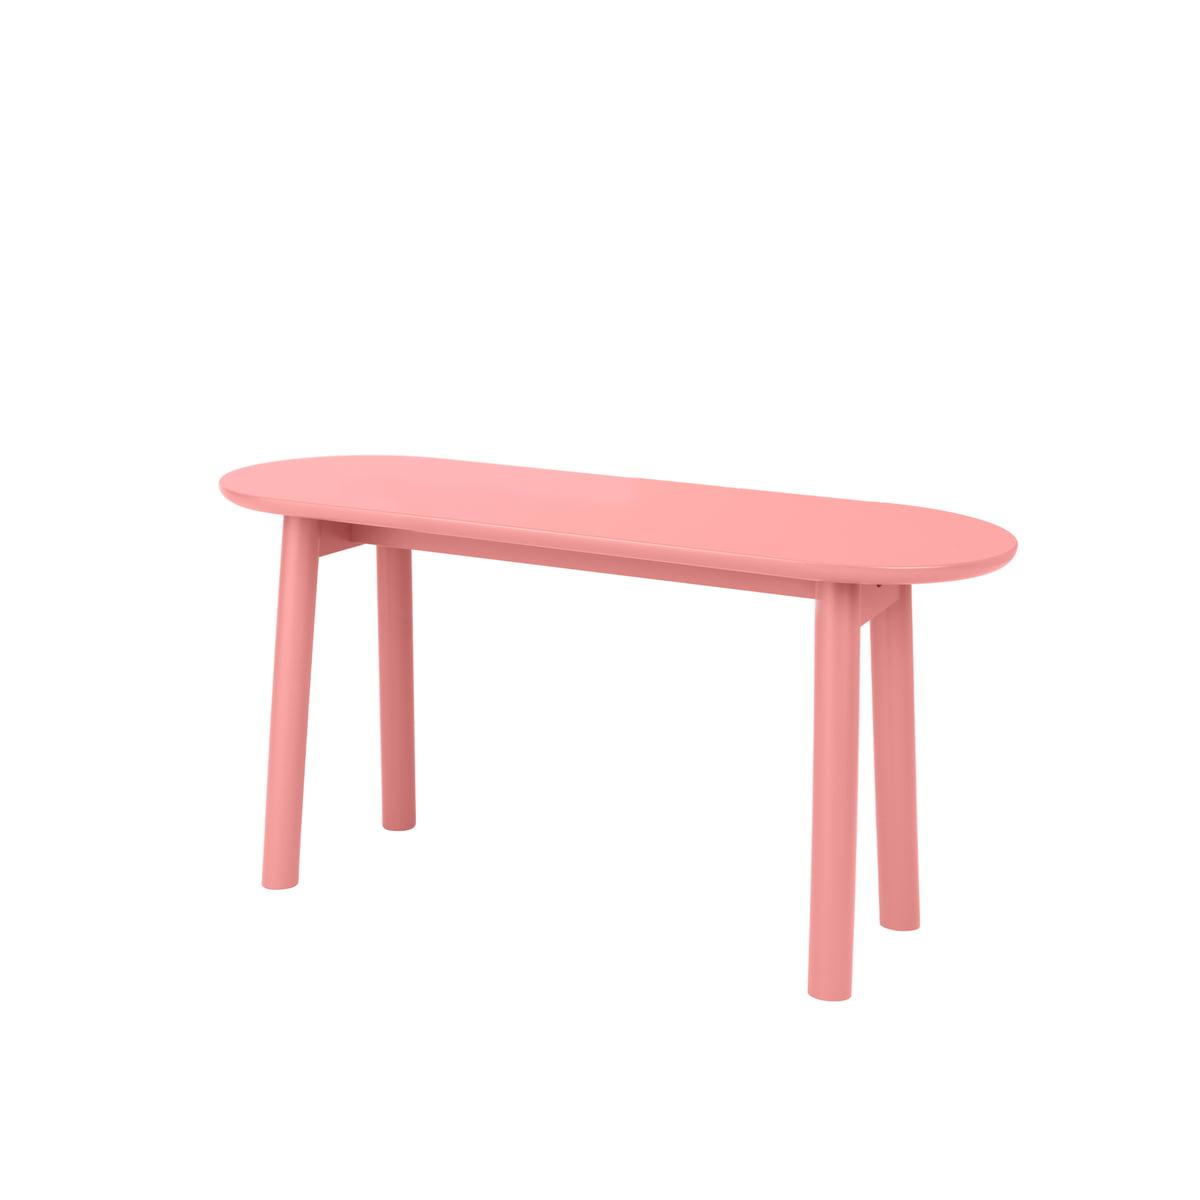 Schönbuch - Mala Sitzbank, 75 cm, flamingo pink